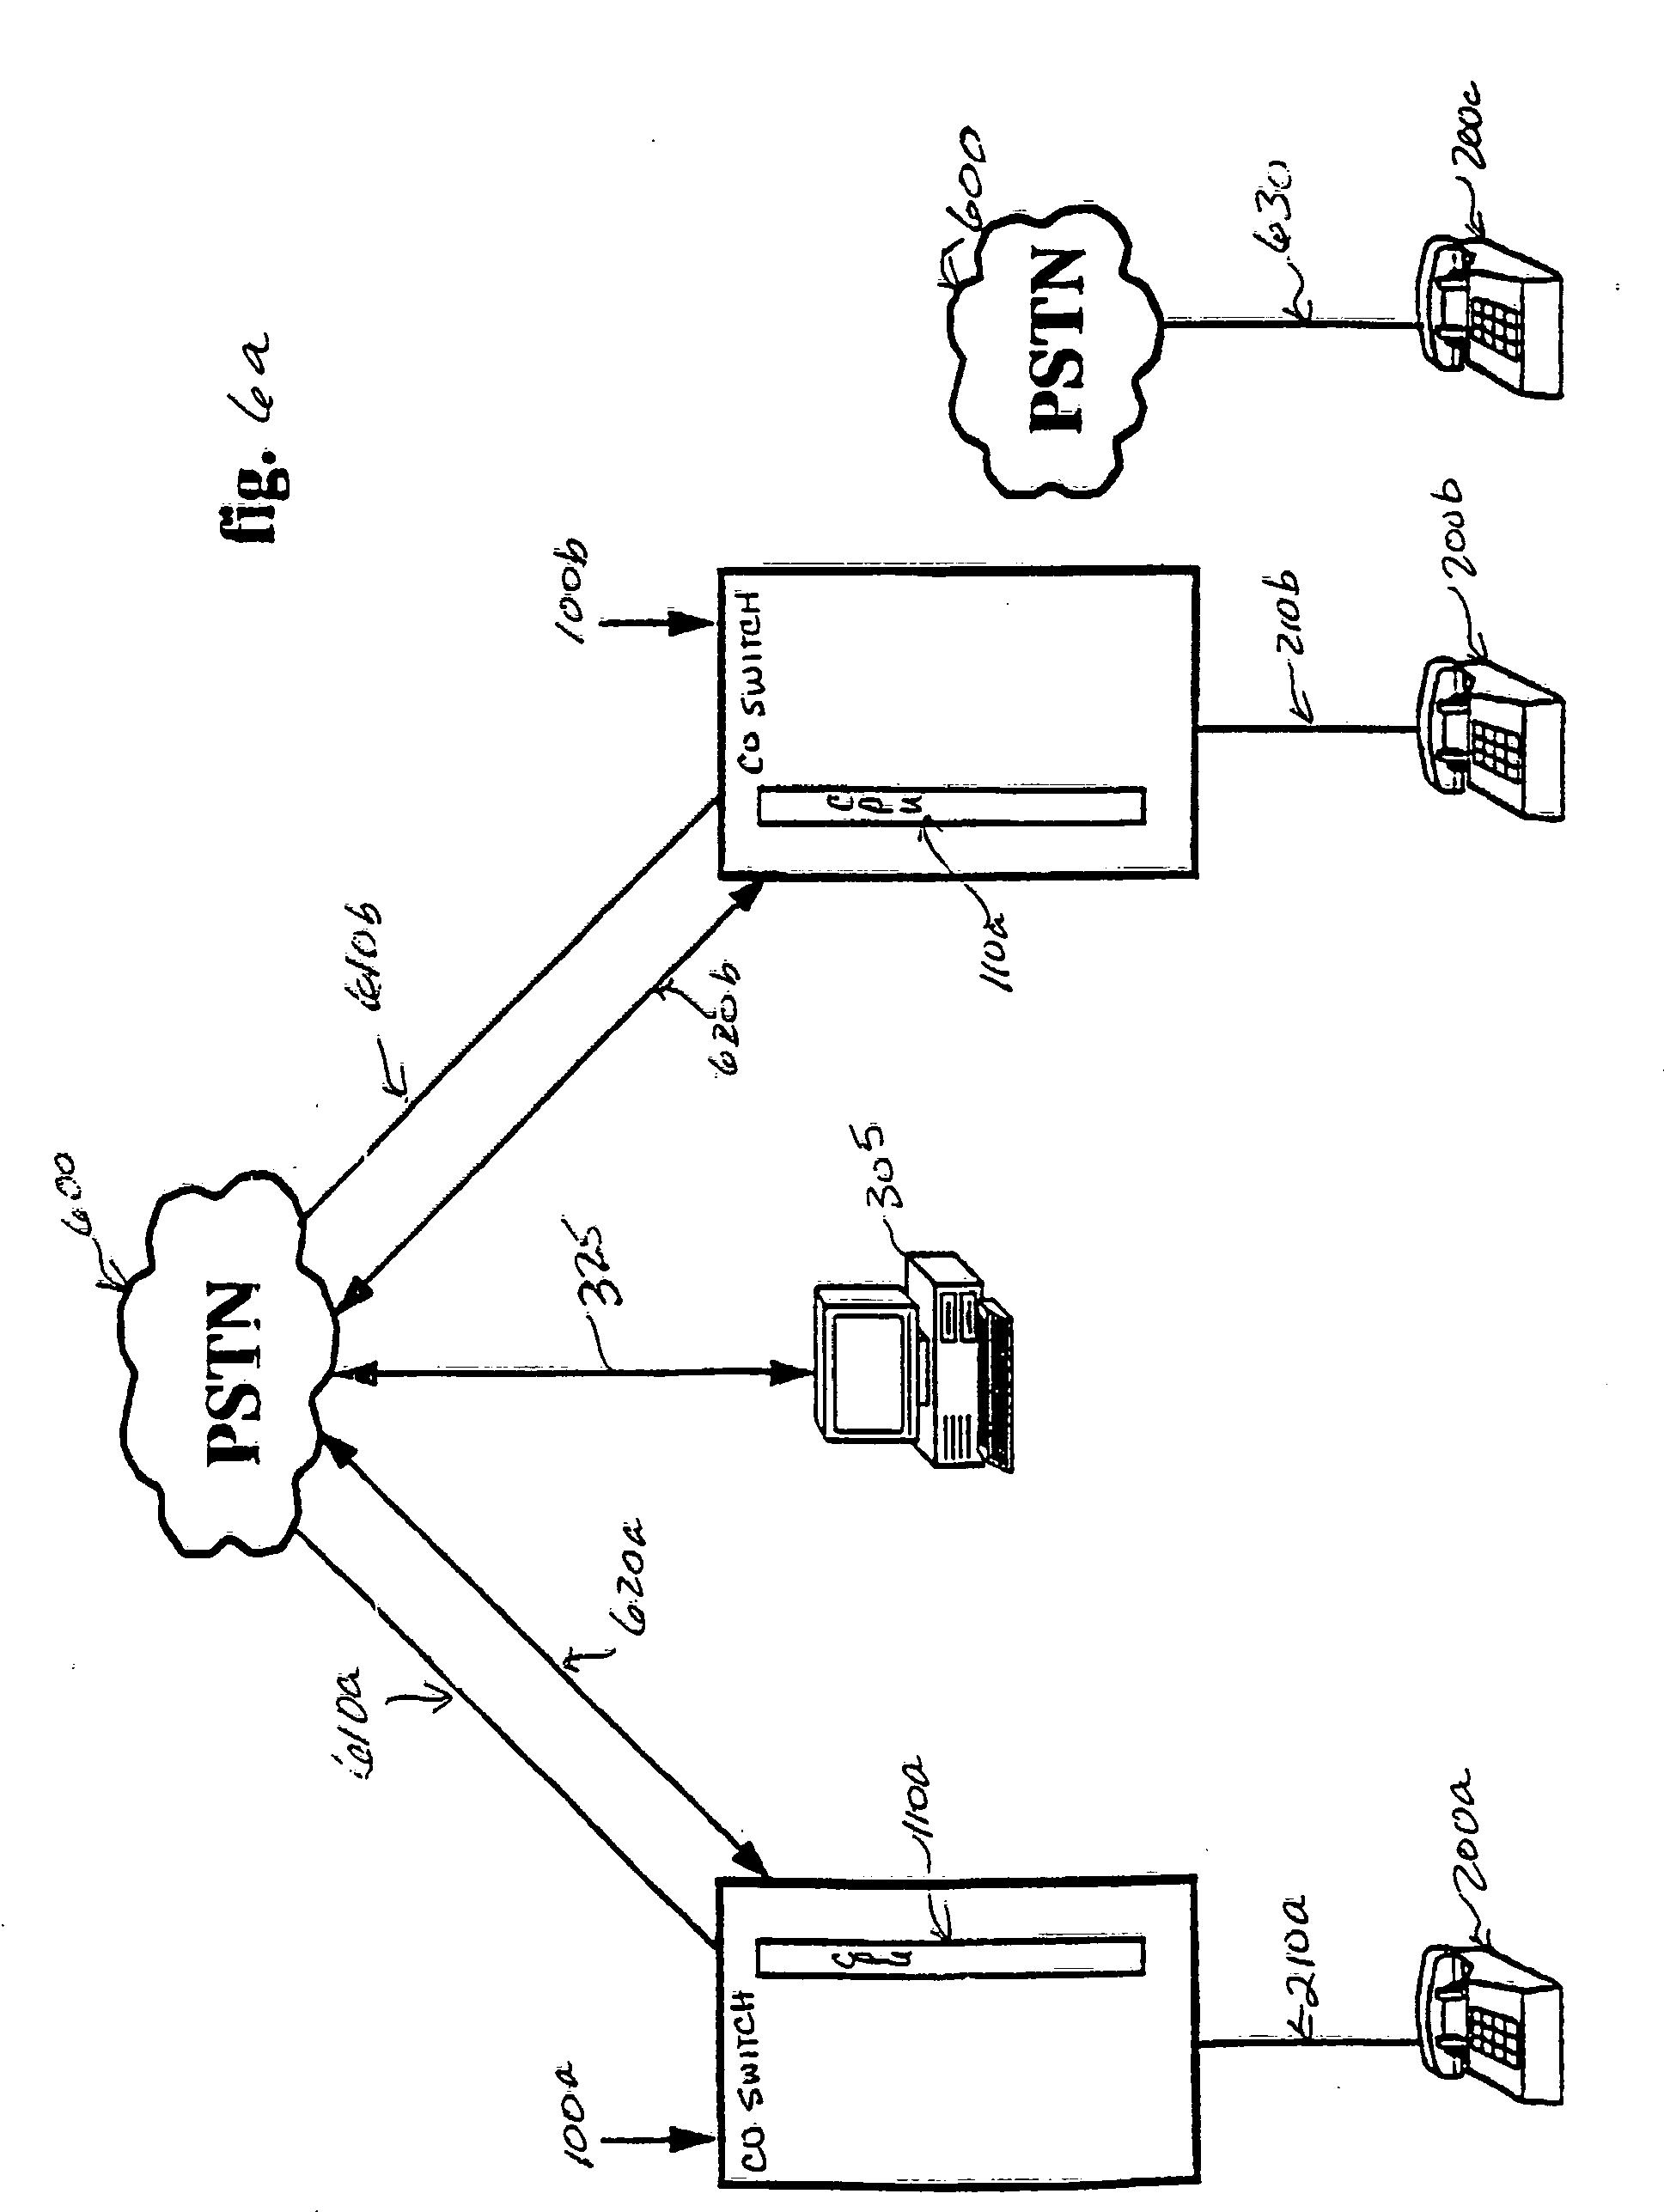 patent ep0974113b1 echtzeit teilnehmer geb hrensystem. Black Bedroom Furniture Sets. Home Design Ideas